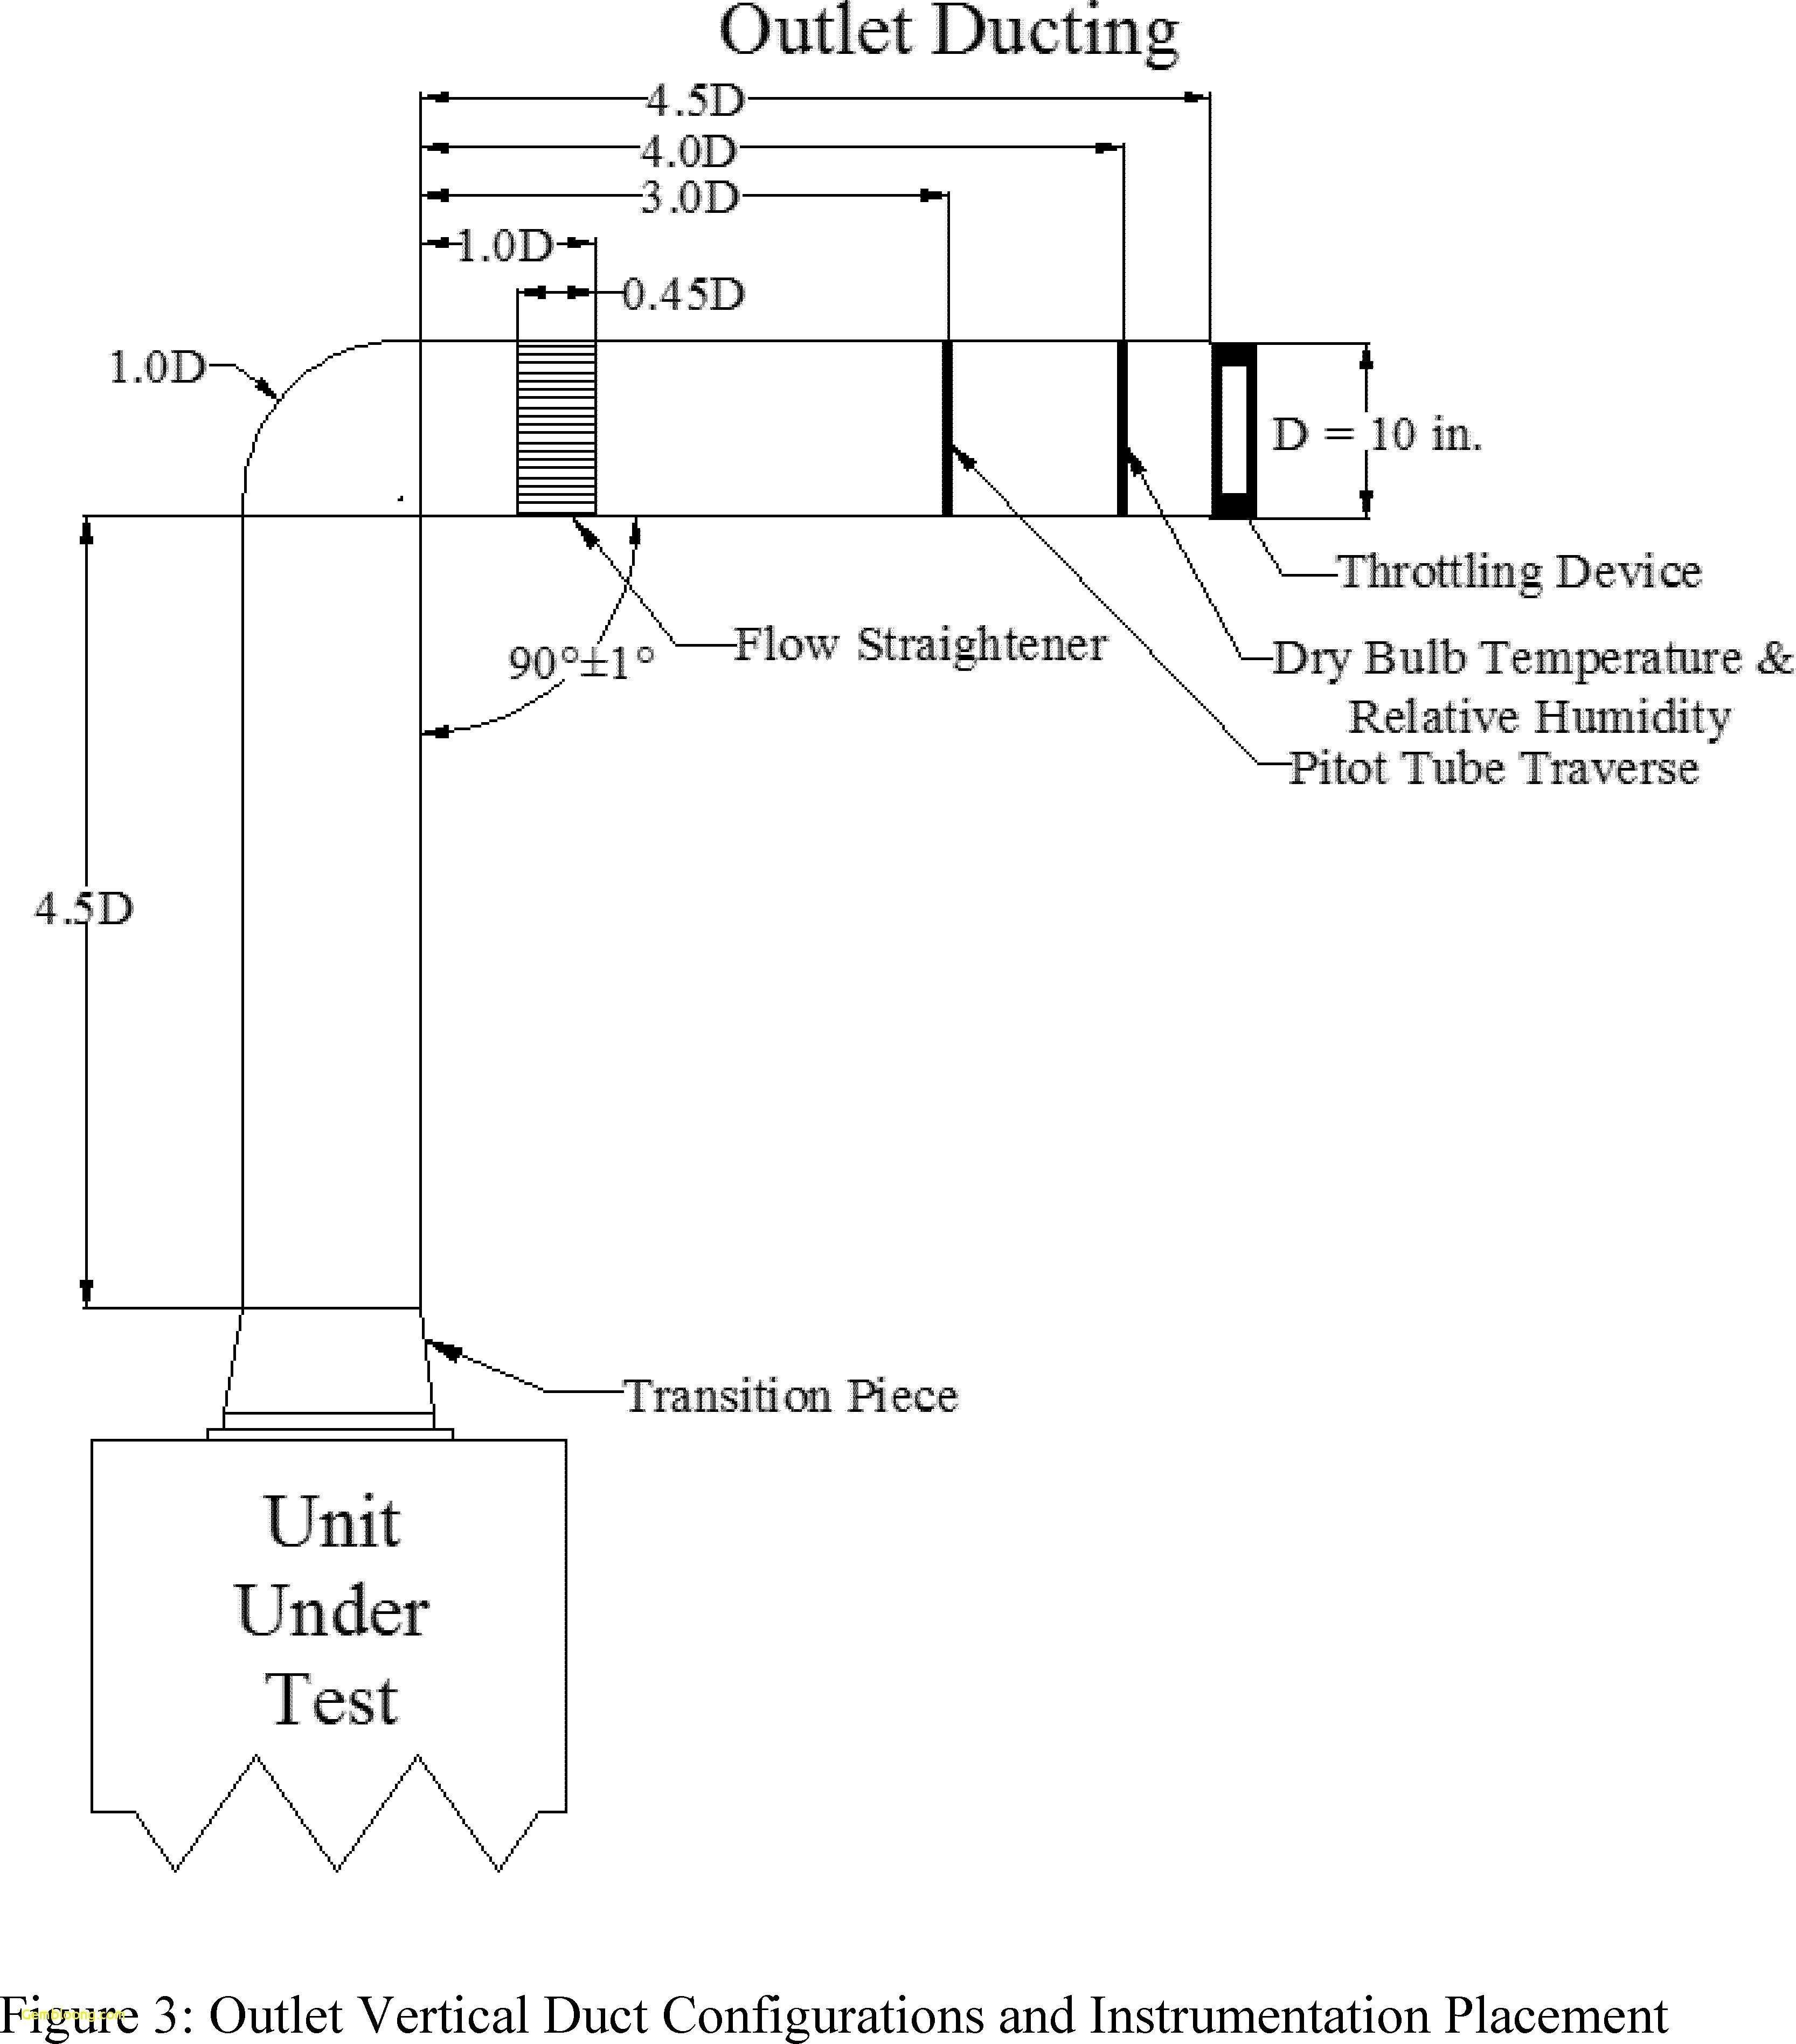 Electric Water Heater Wiring Diagram Service Water Heater Facesinnature Of Electric Water Heater Wiring Diagram